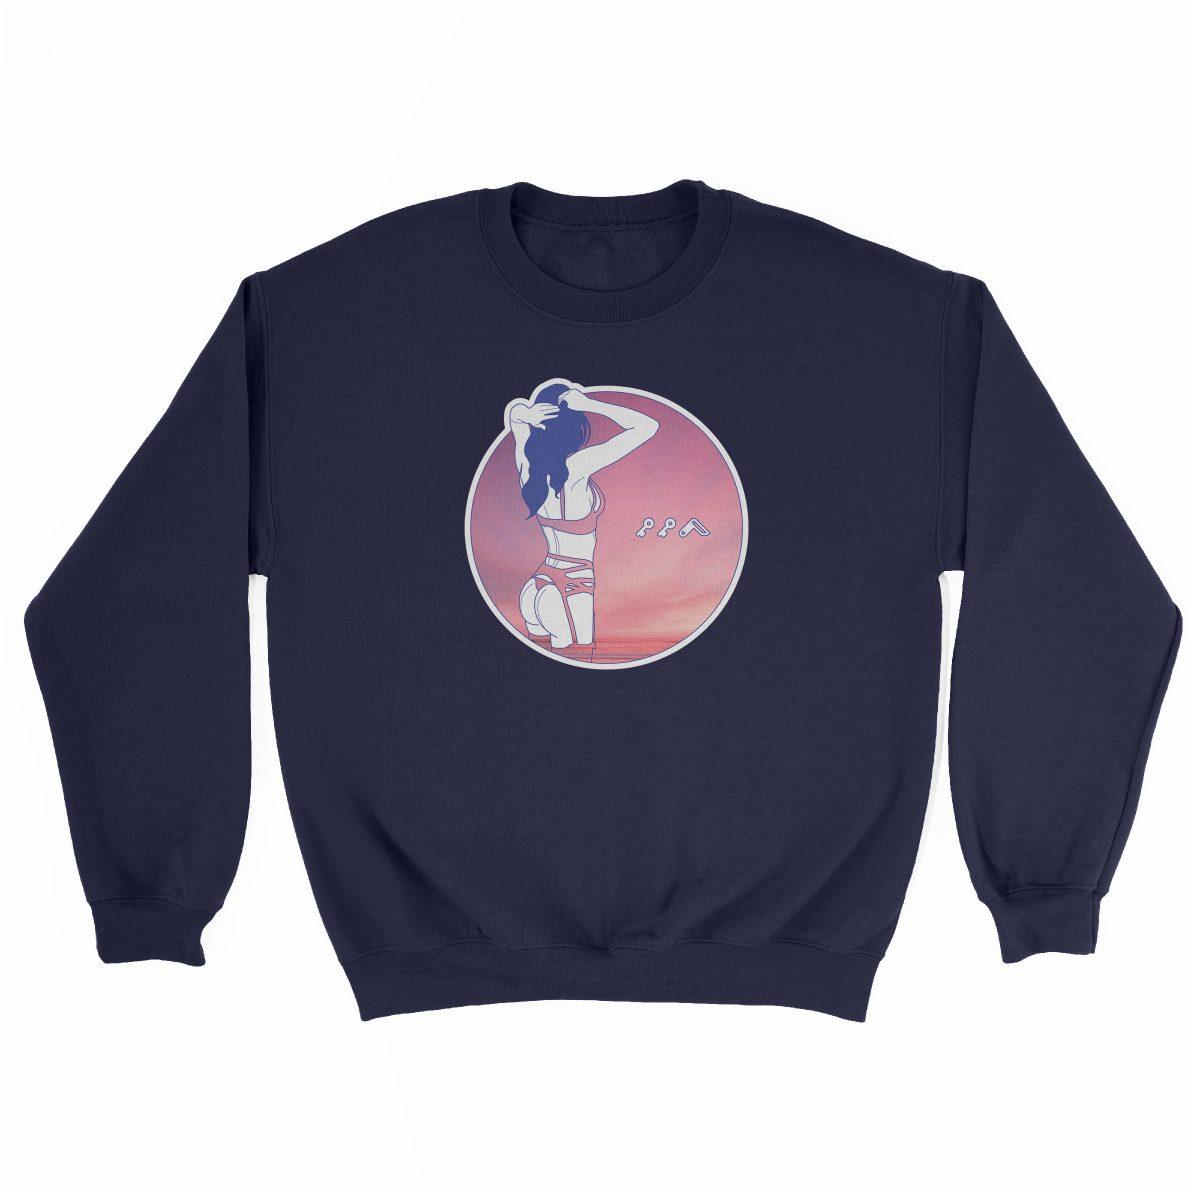 """NIGHT MOVES"" music festival beach sweatshirt in navy"